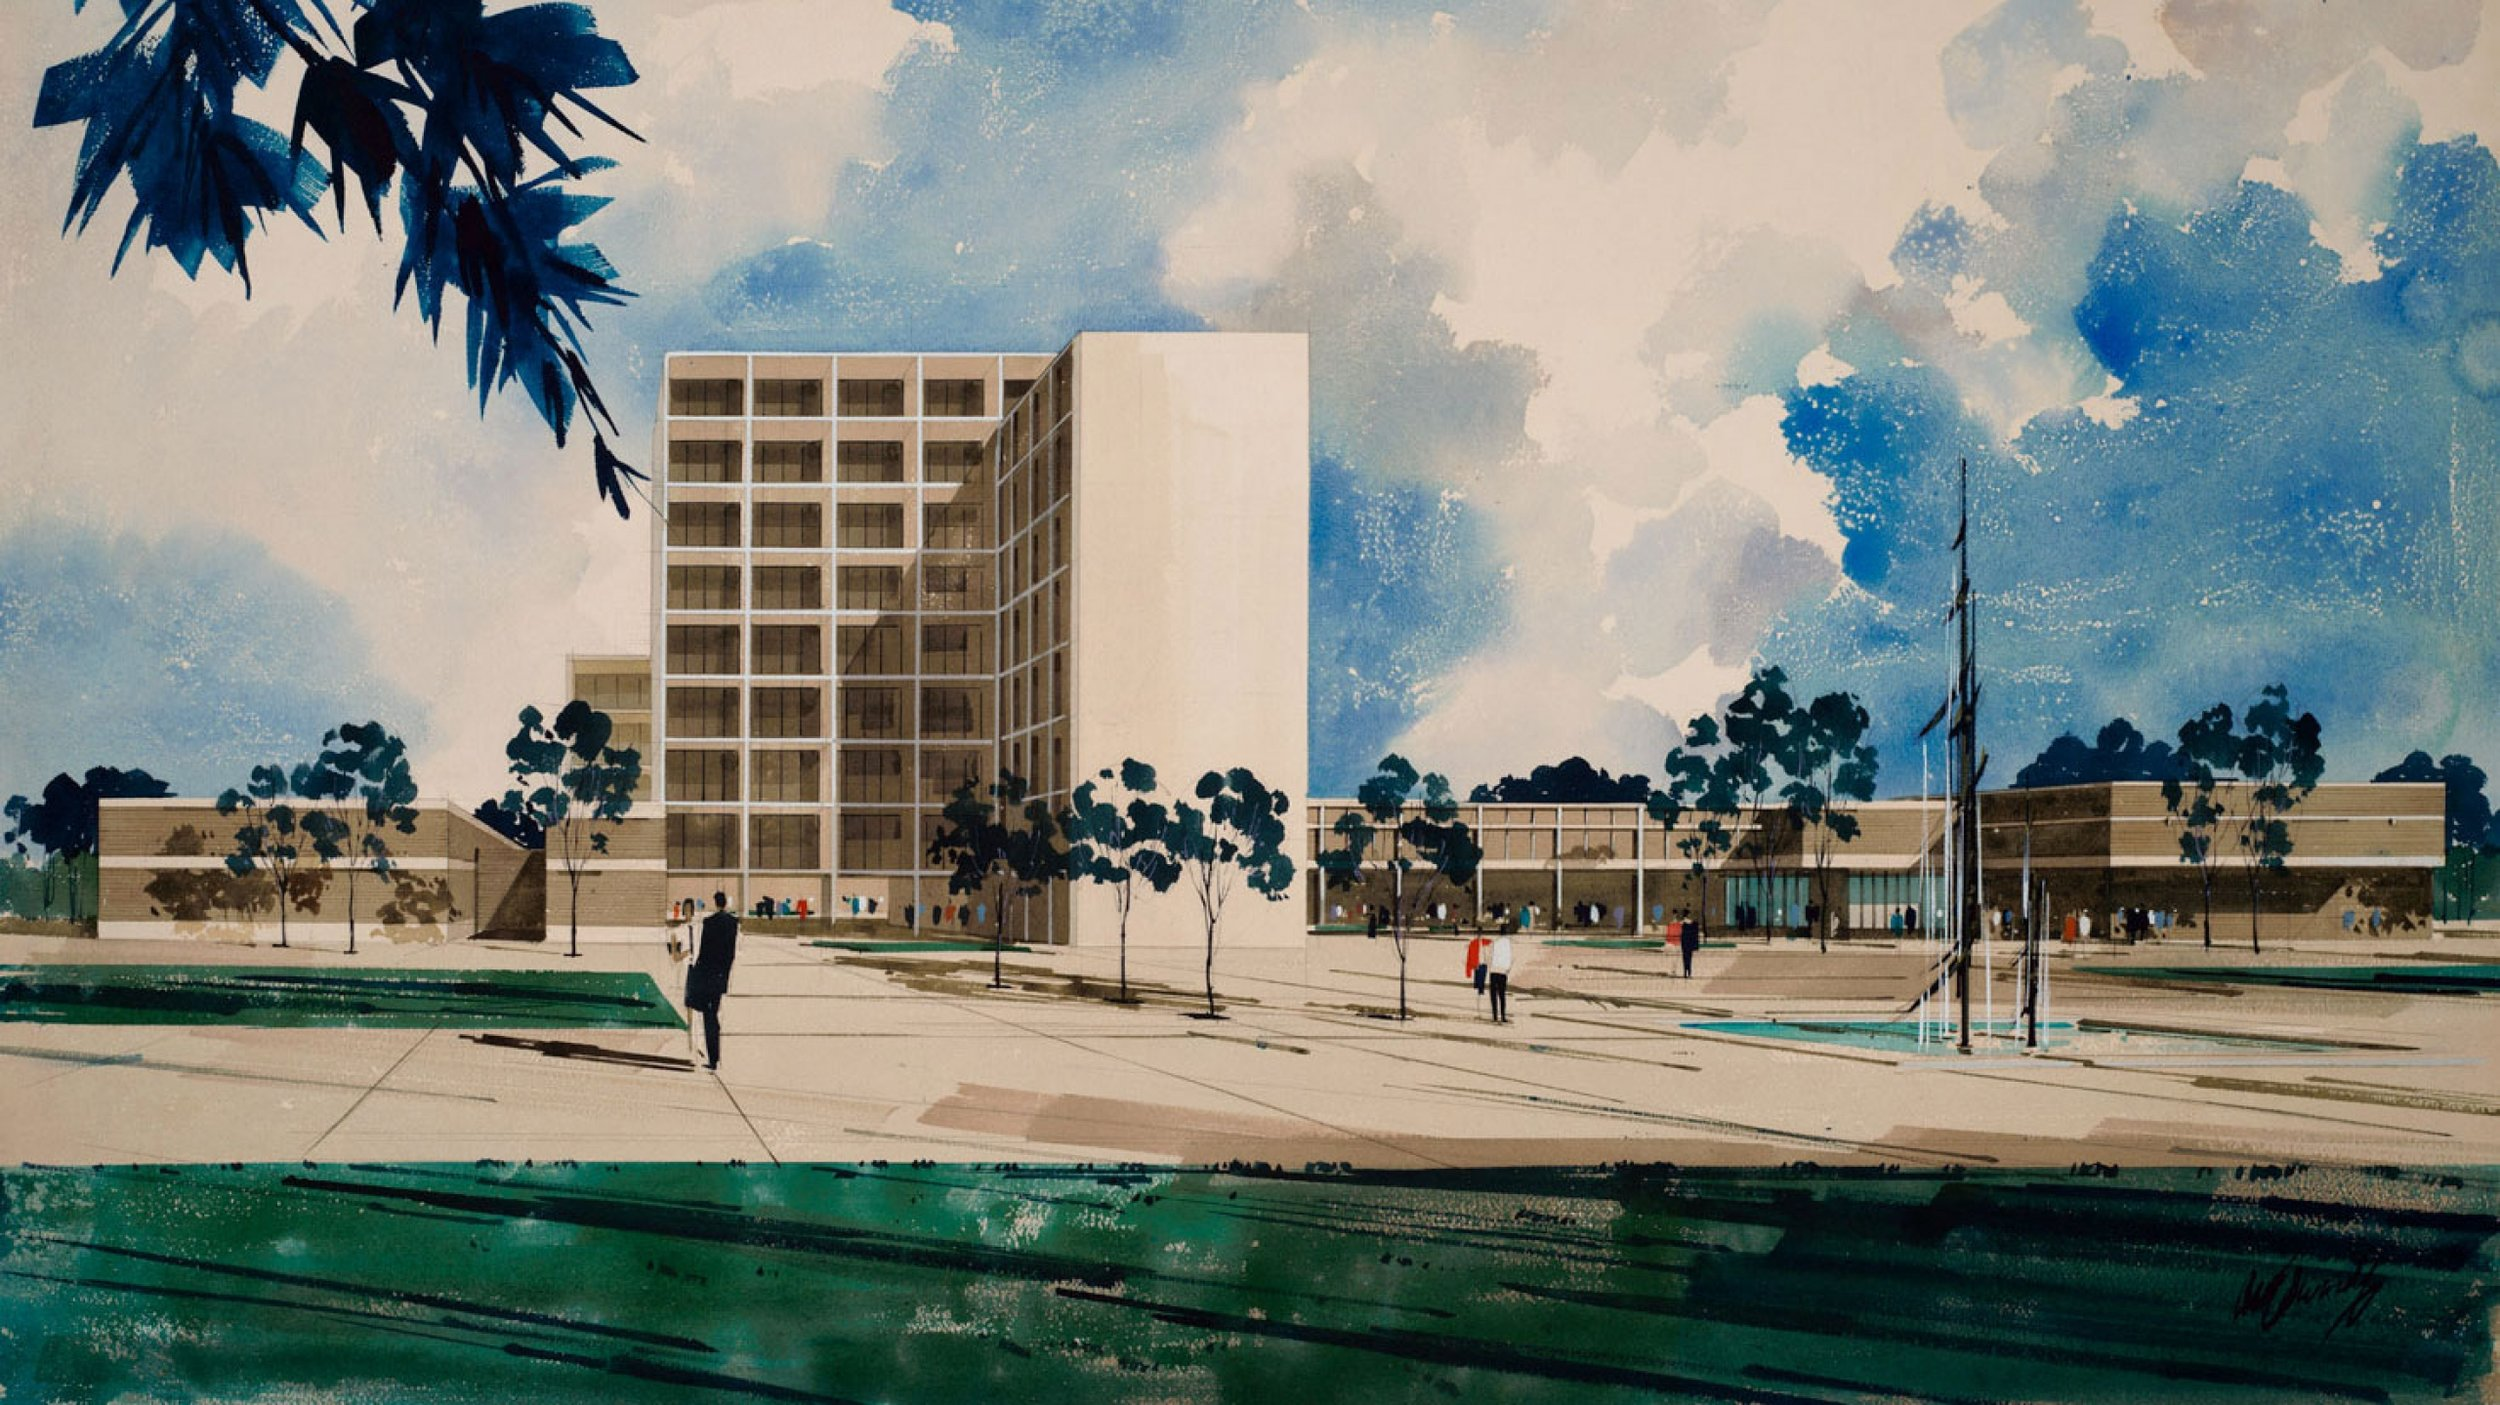 university-of-victoria-maclaurin-r-w2560-q100-m1507731420.jpg